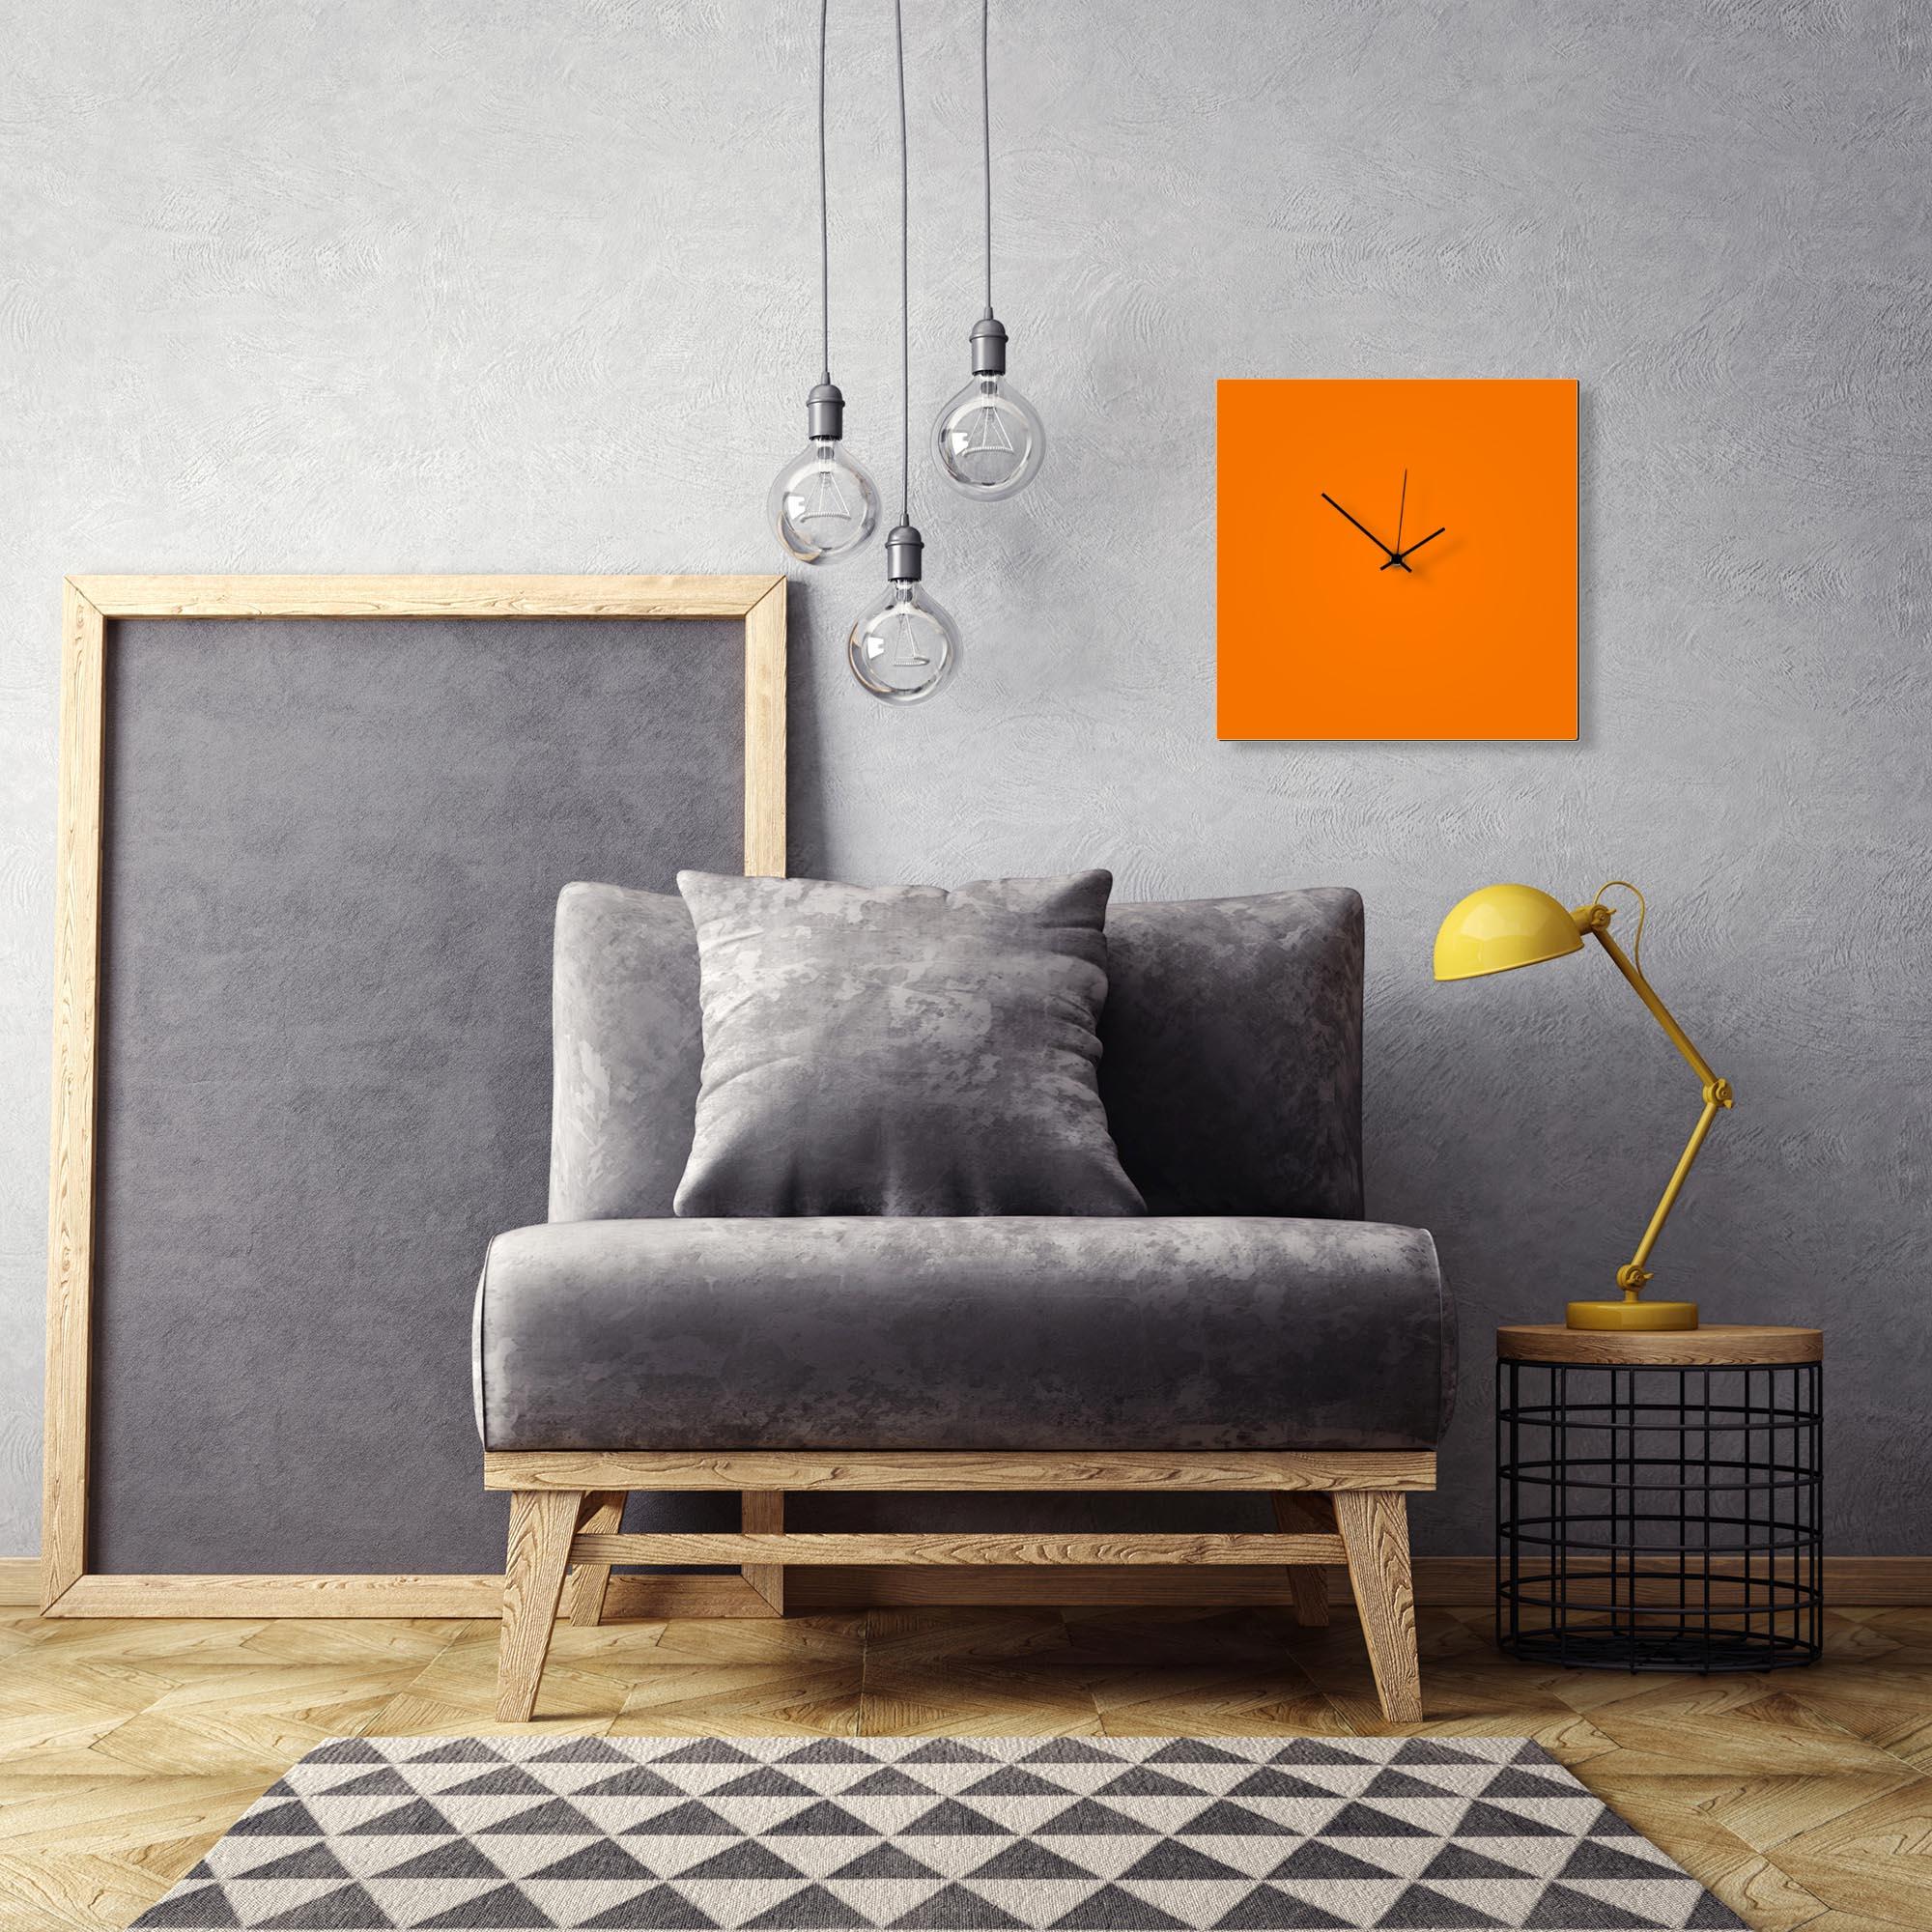 Orangeout Black Square Clock by Adam Schwoeppe Contemporary Clock on Aluminum Polymetal - Alternate View 1